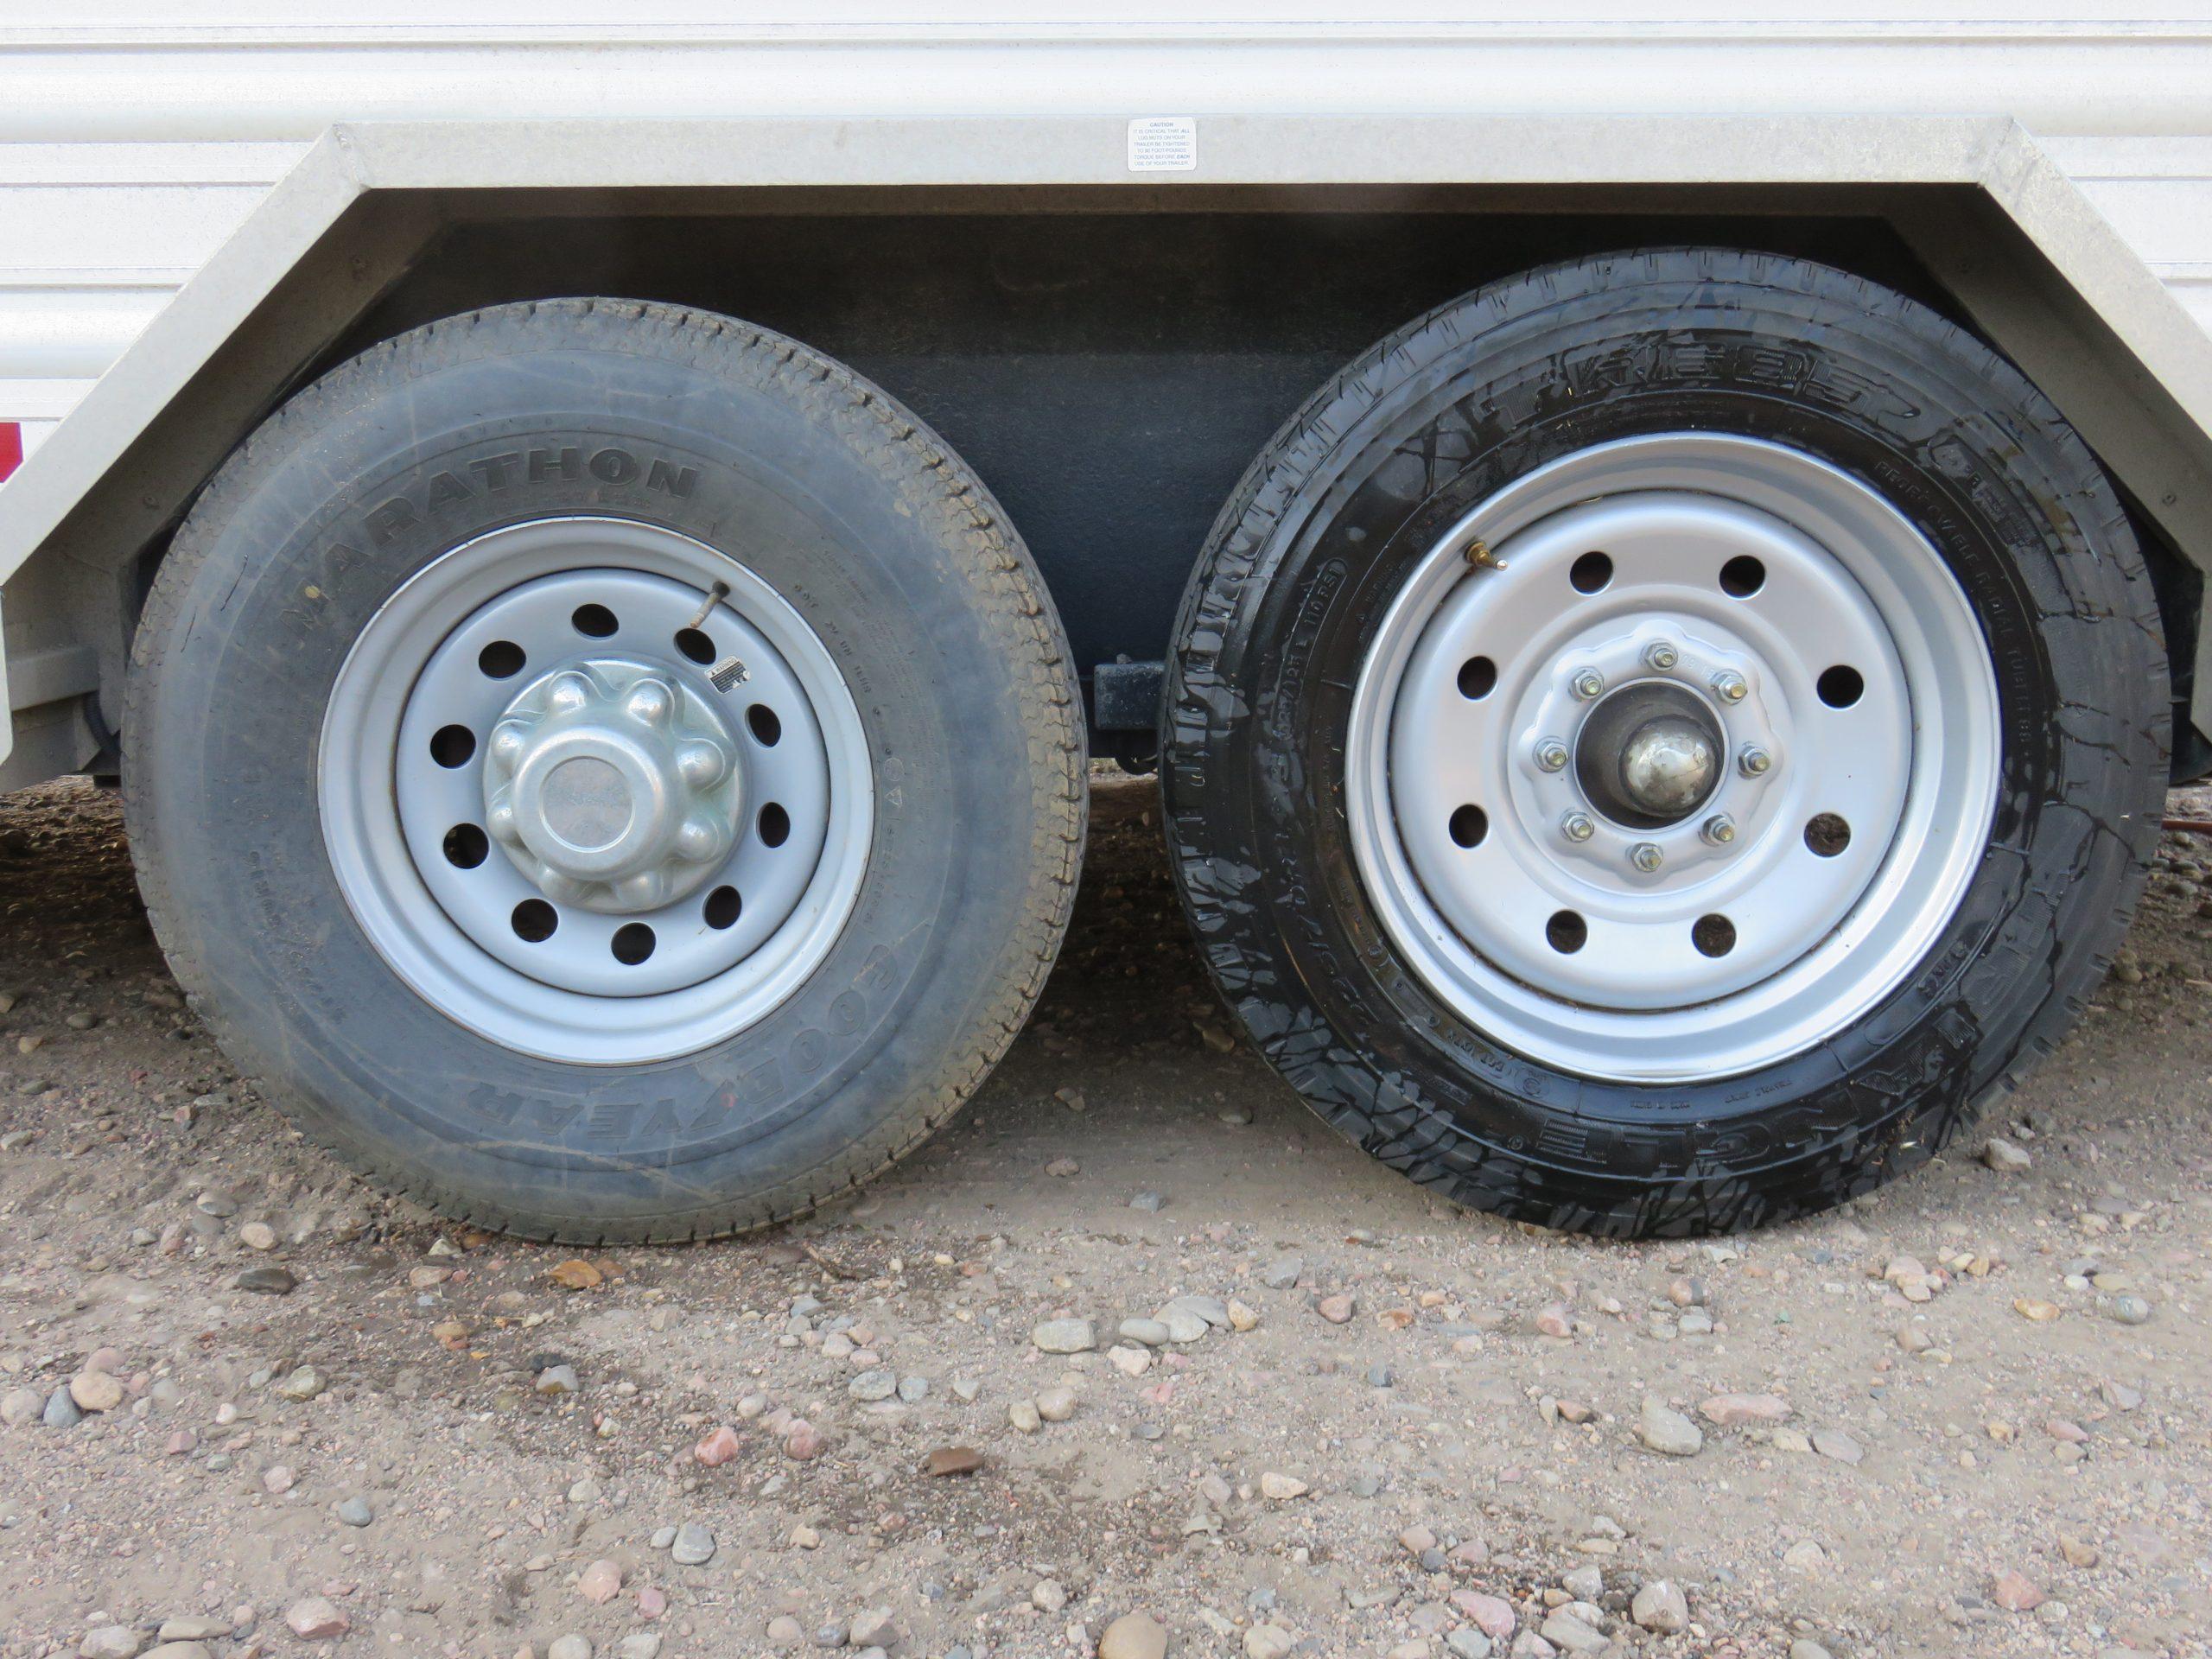 boar trailer tire and wheel